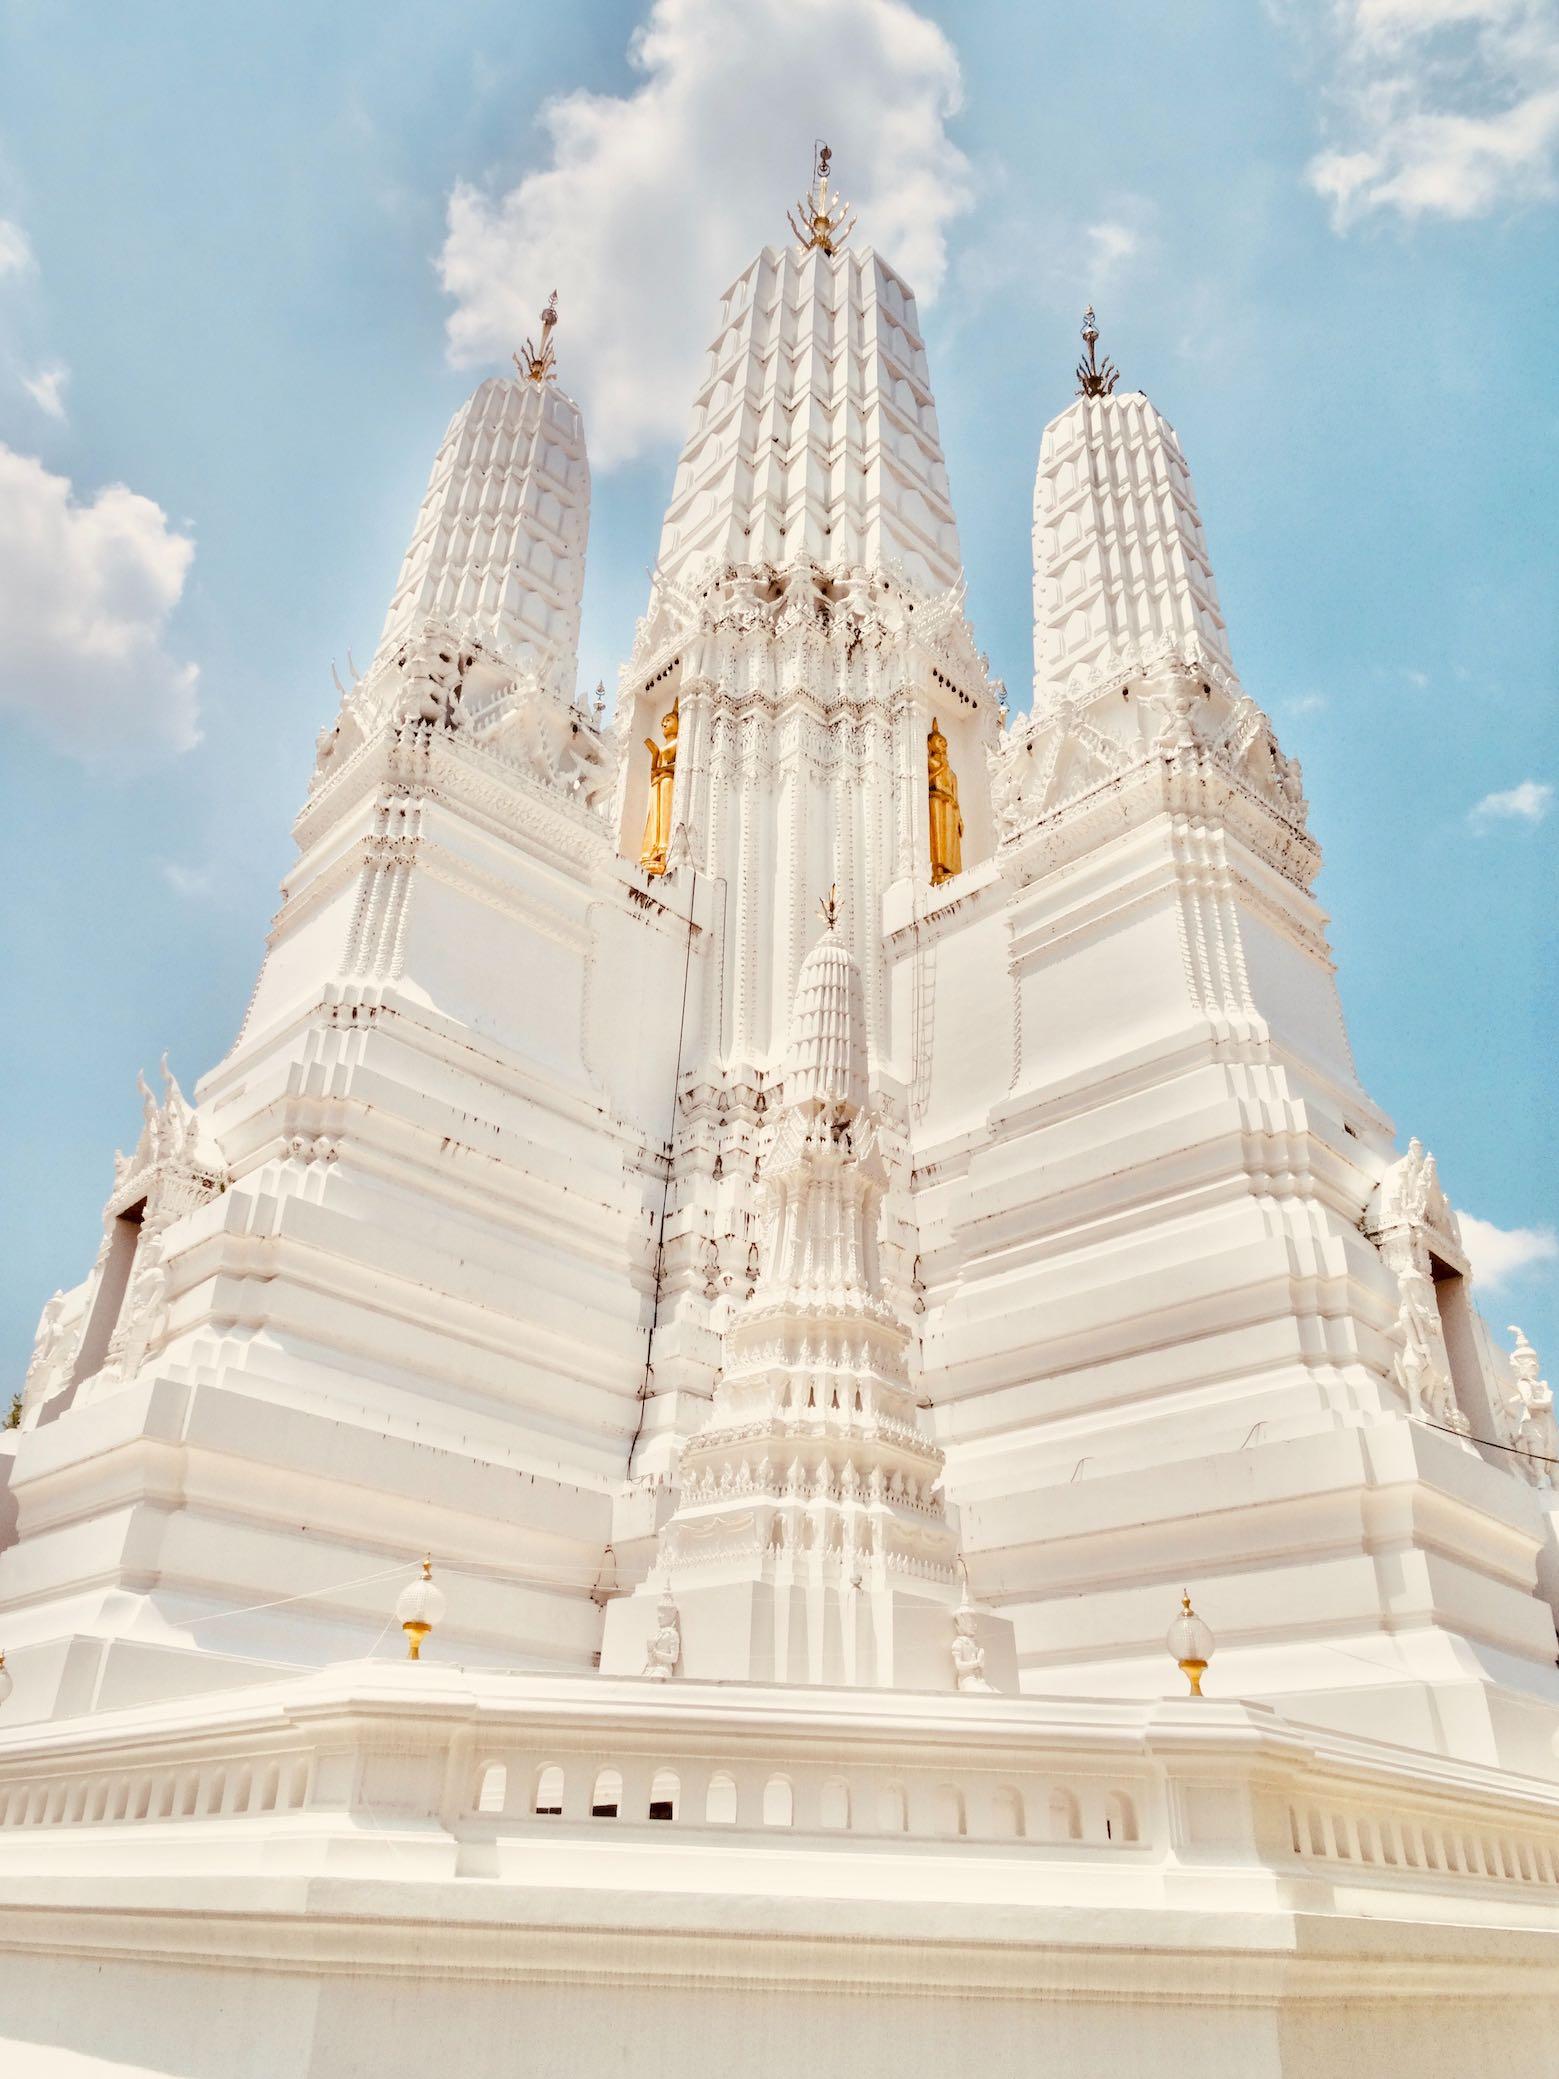 Wat Mahathat Worawihan Temple in Phetchaburi